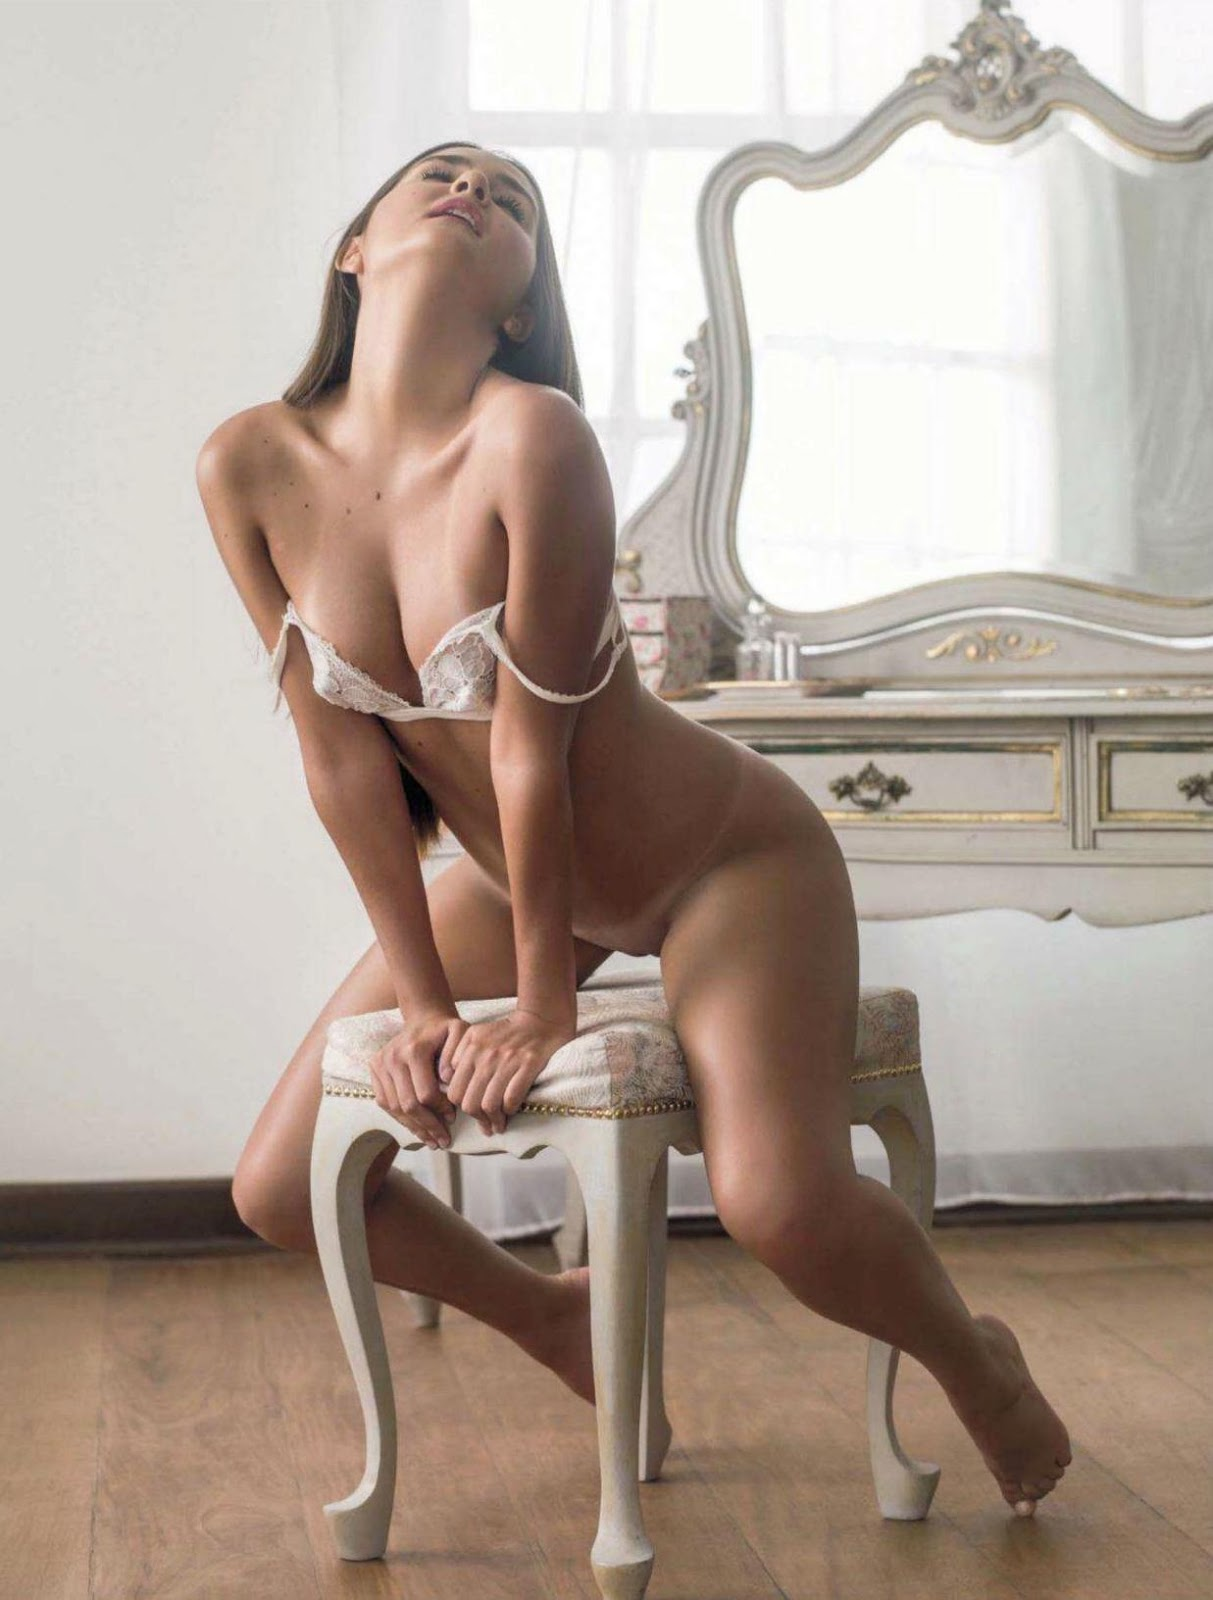 http://3.bp.blogspot.com/-bXdx06FTso8/UO21pDtjwbI/AAAAAAAAHq8/6IPlbOCBsKw/s1600/689289803_CatarinaMigliorini_011_123_543lo.jpg